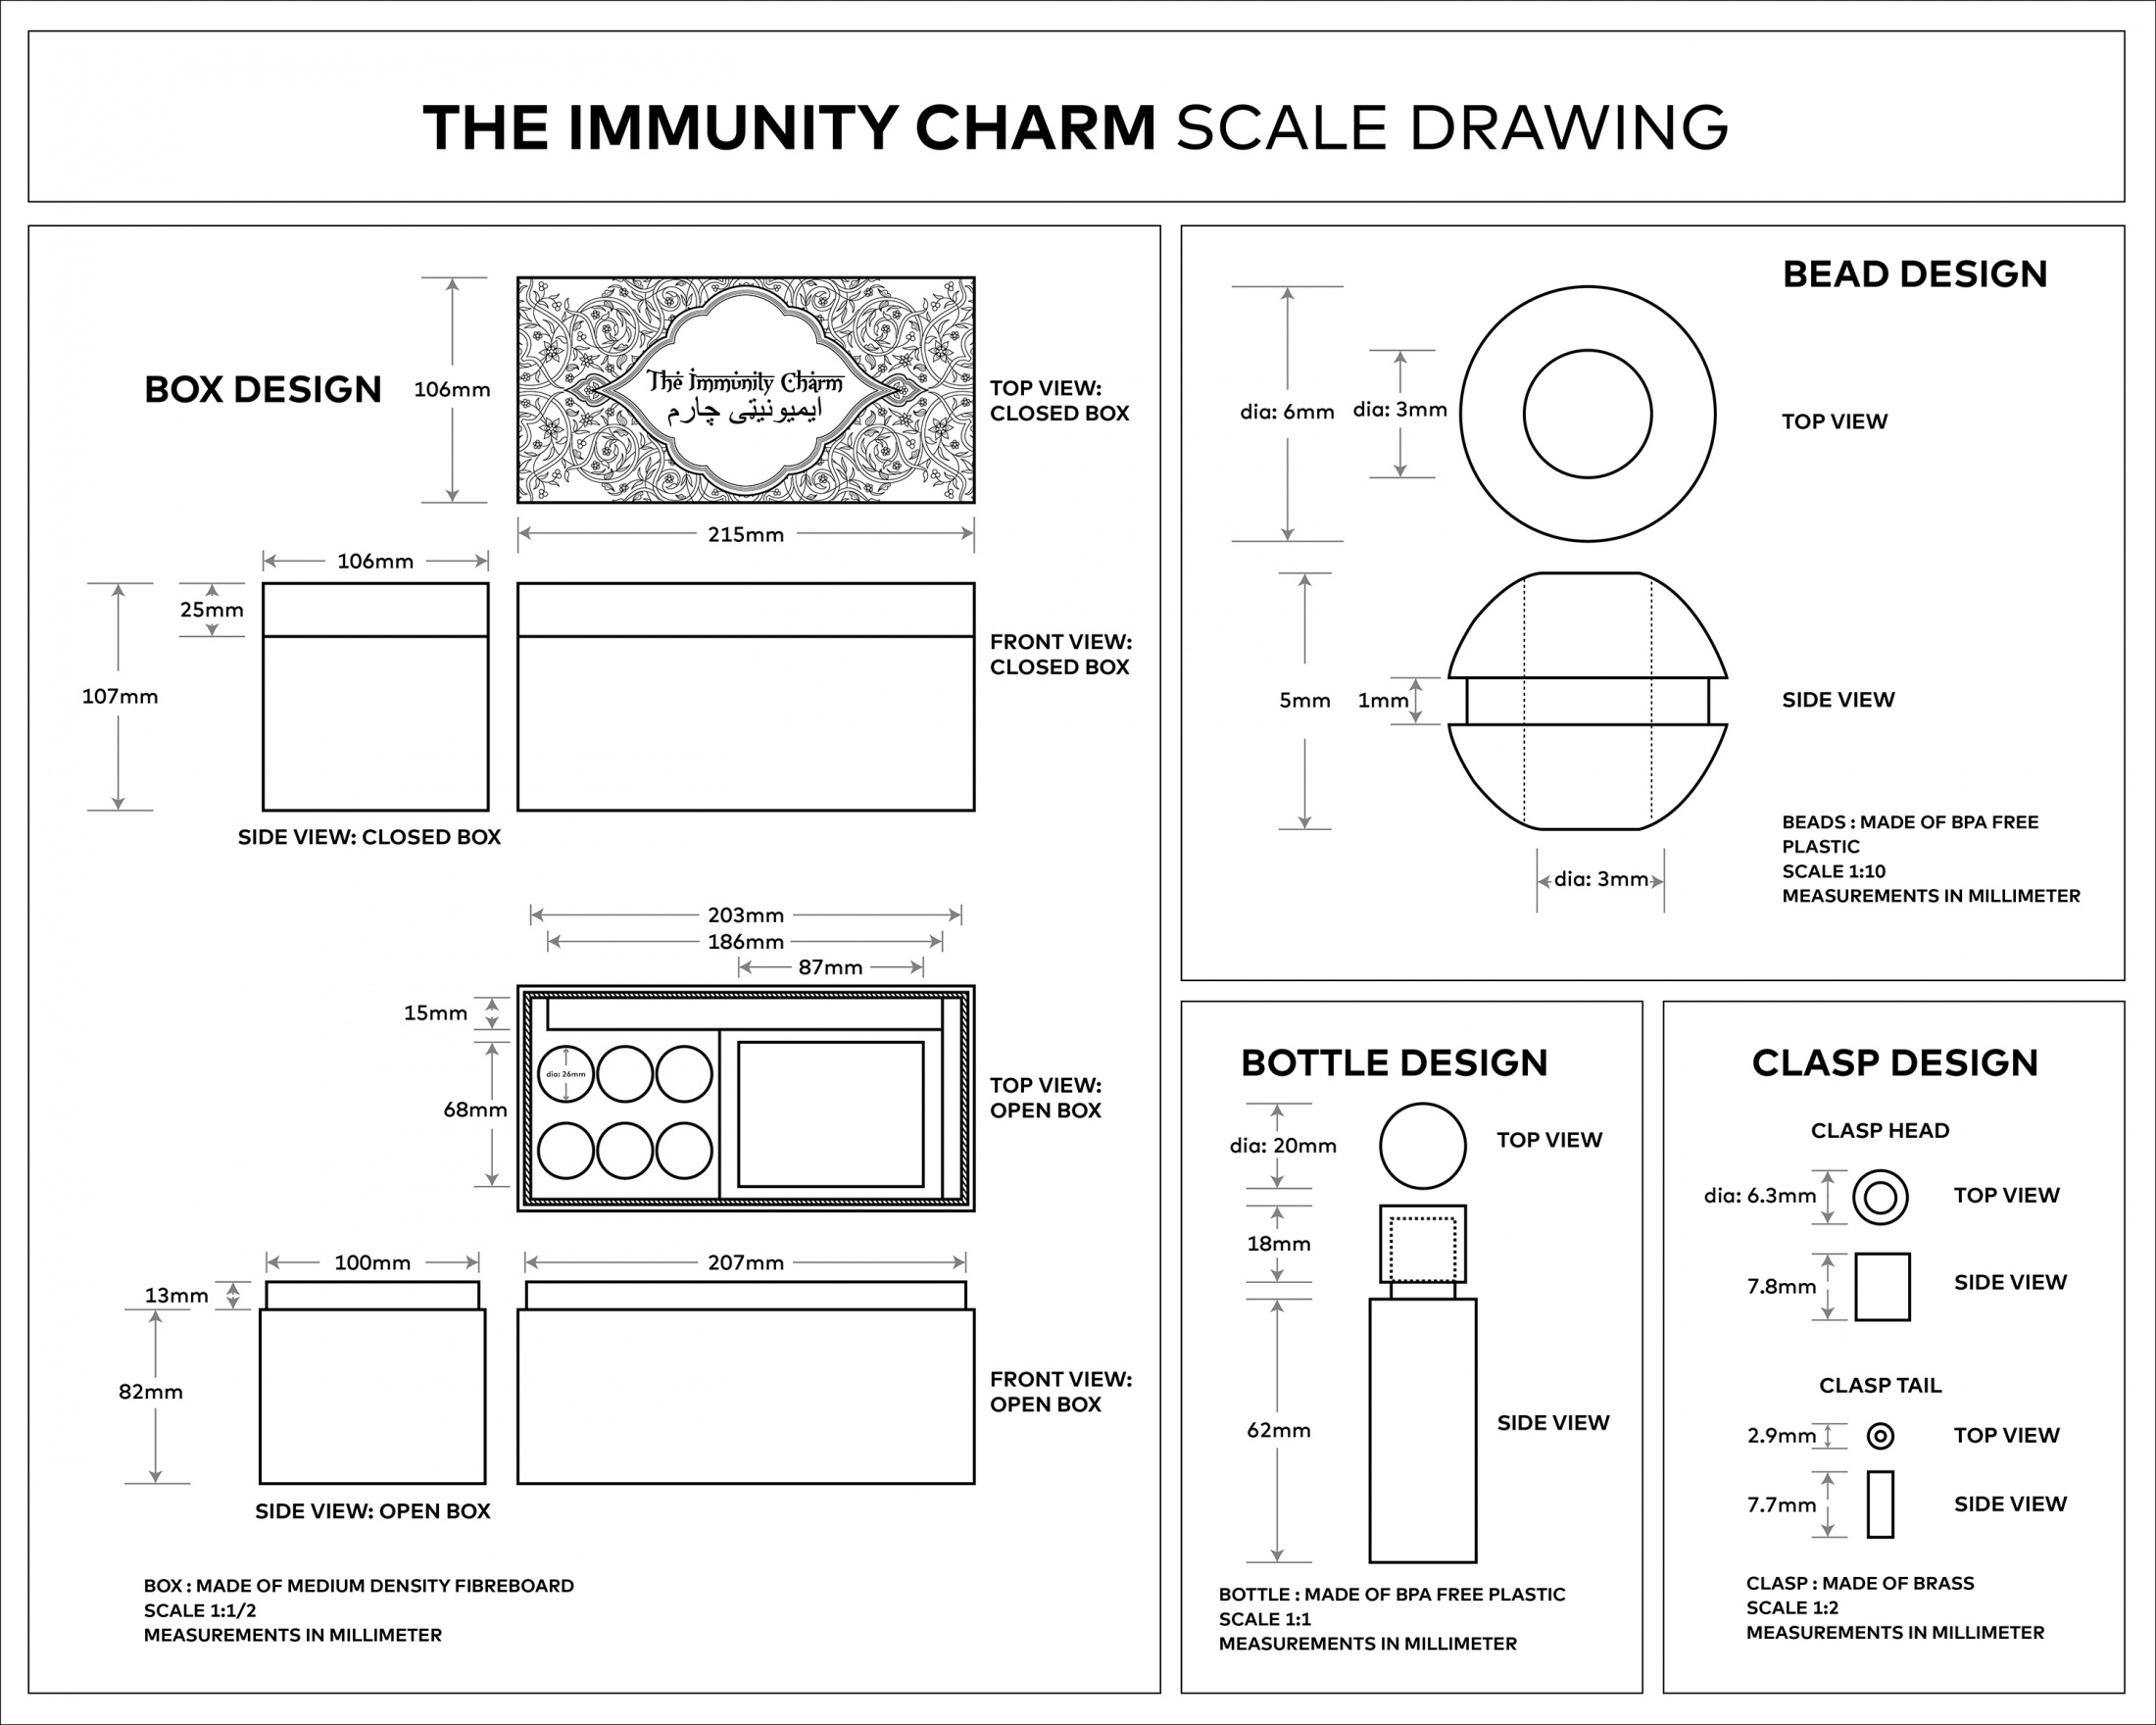 Thumbnail for The Immunity Charm